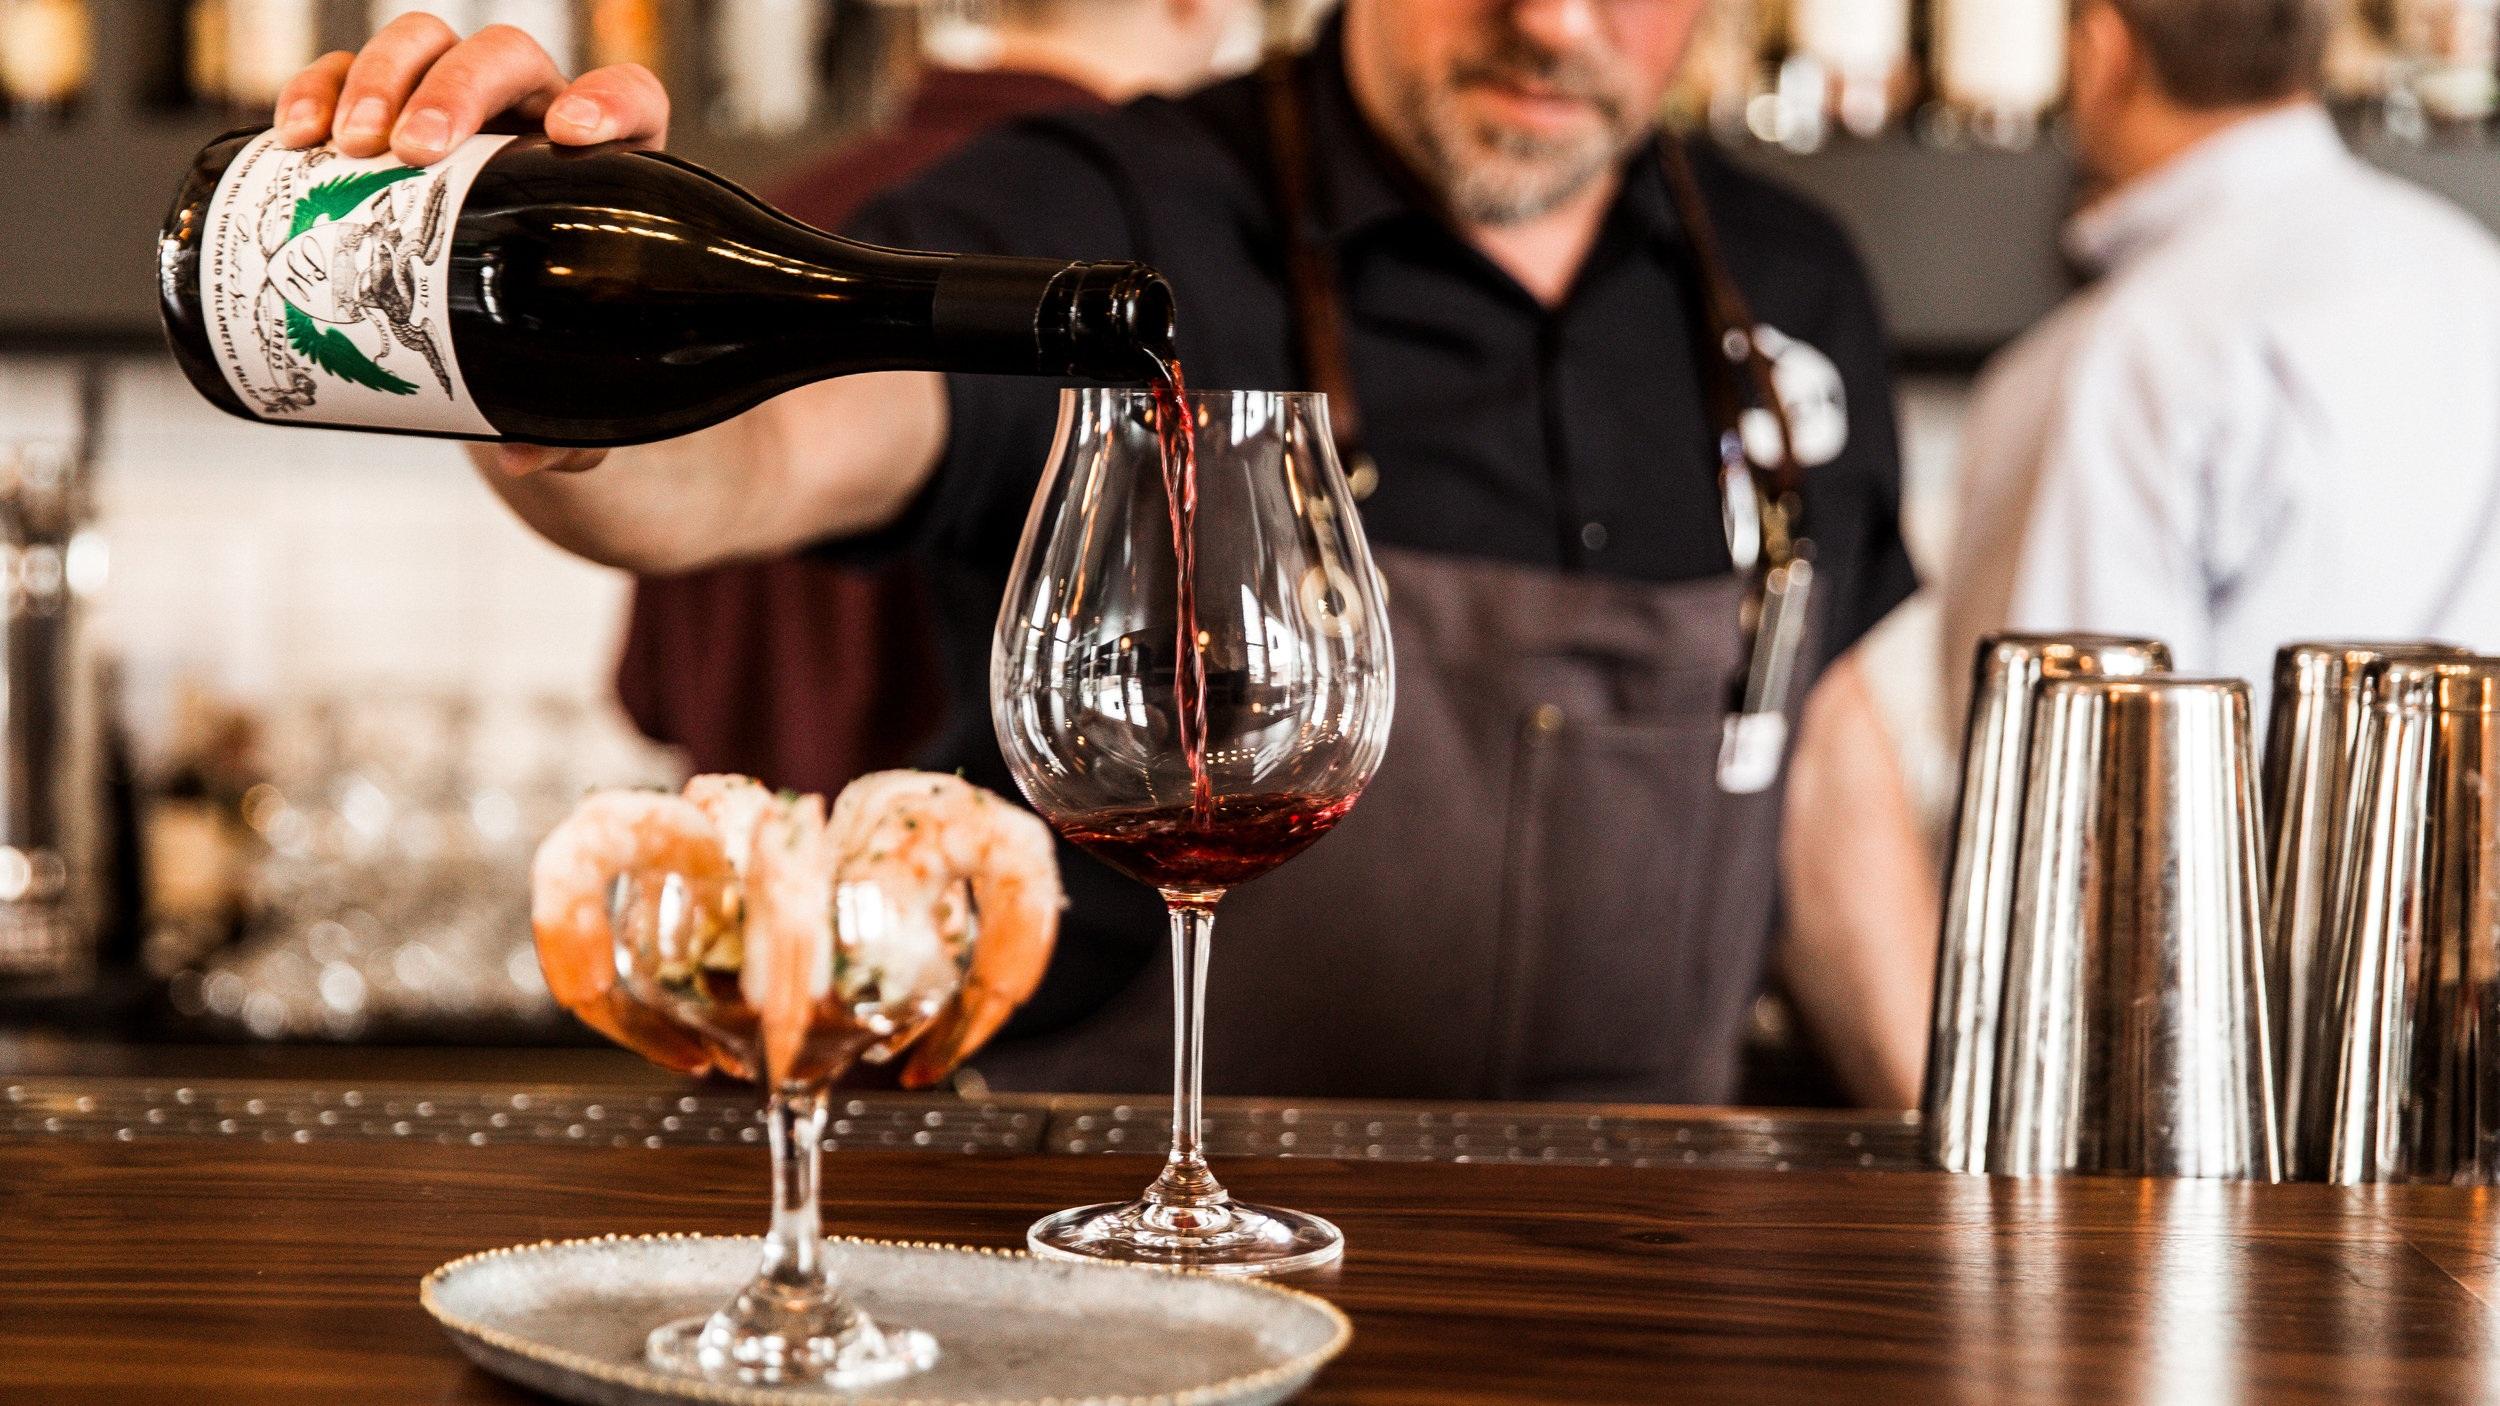 jody+pouring+wine.jpg